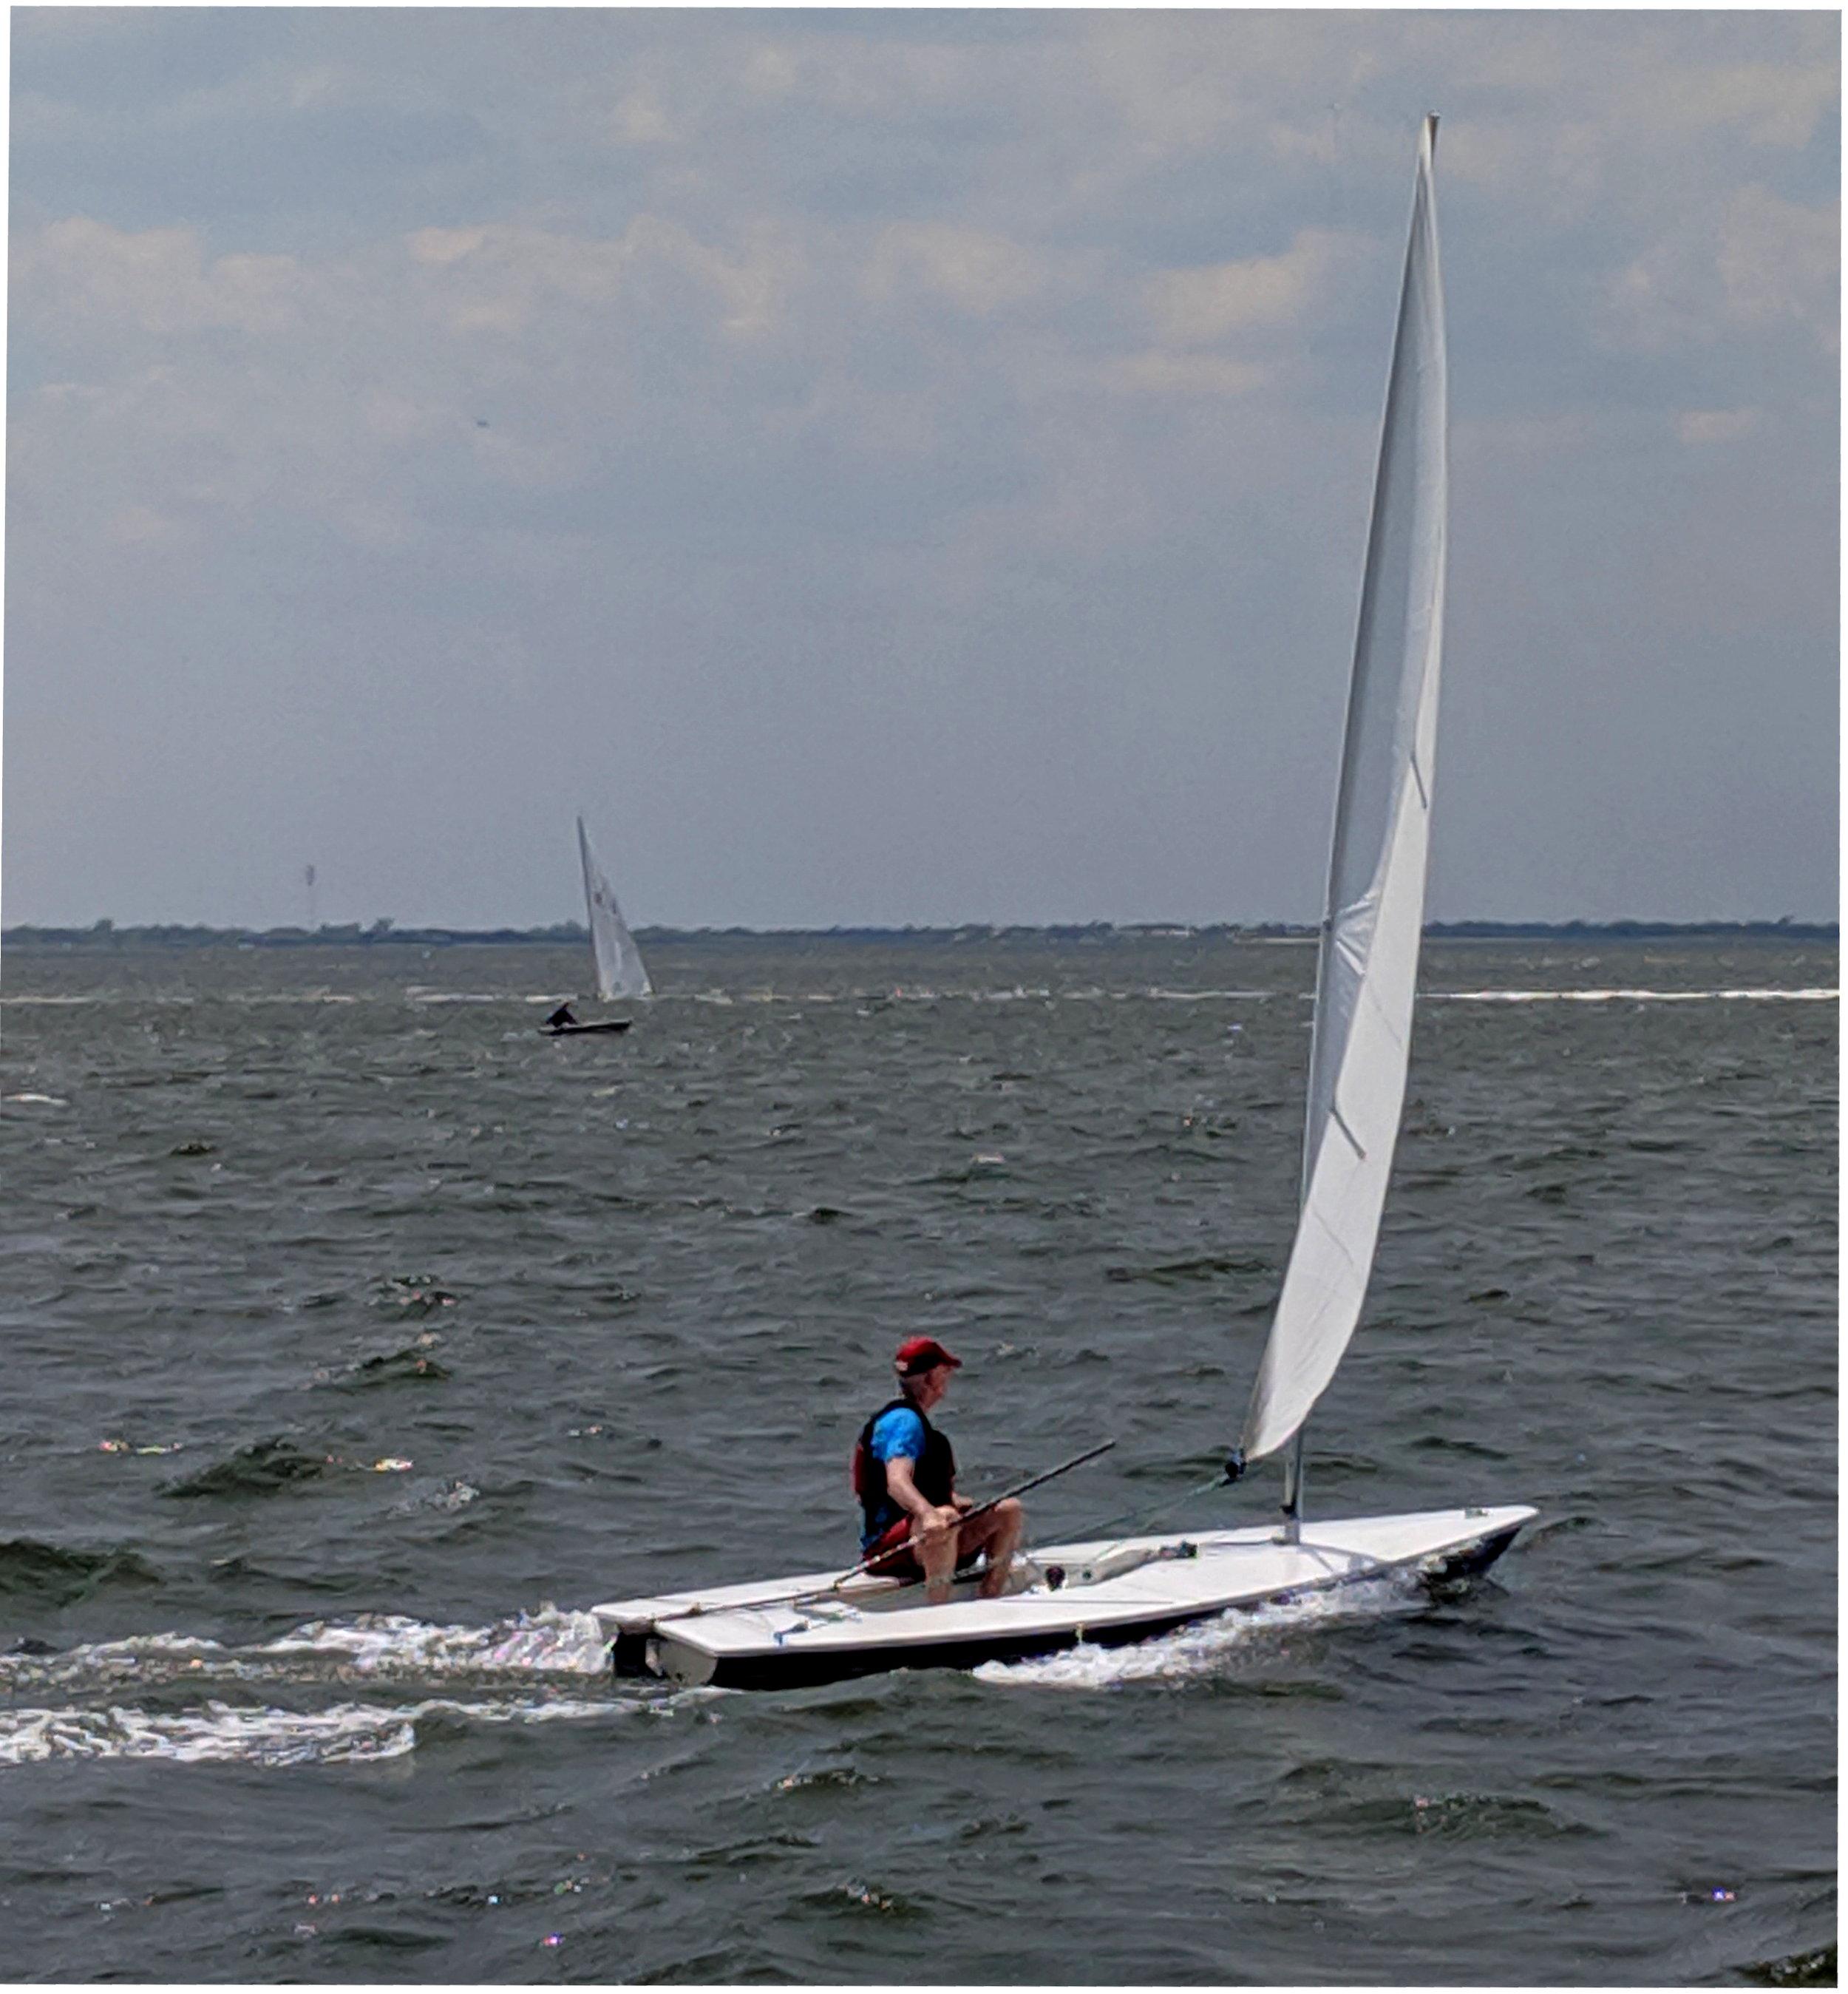 Bernard McElhone, July 14 Landlubber Race